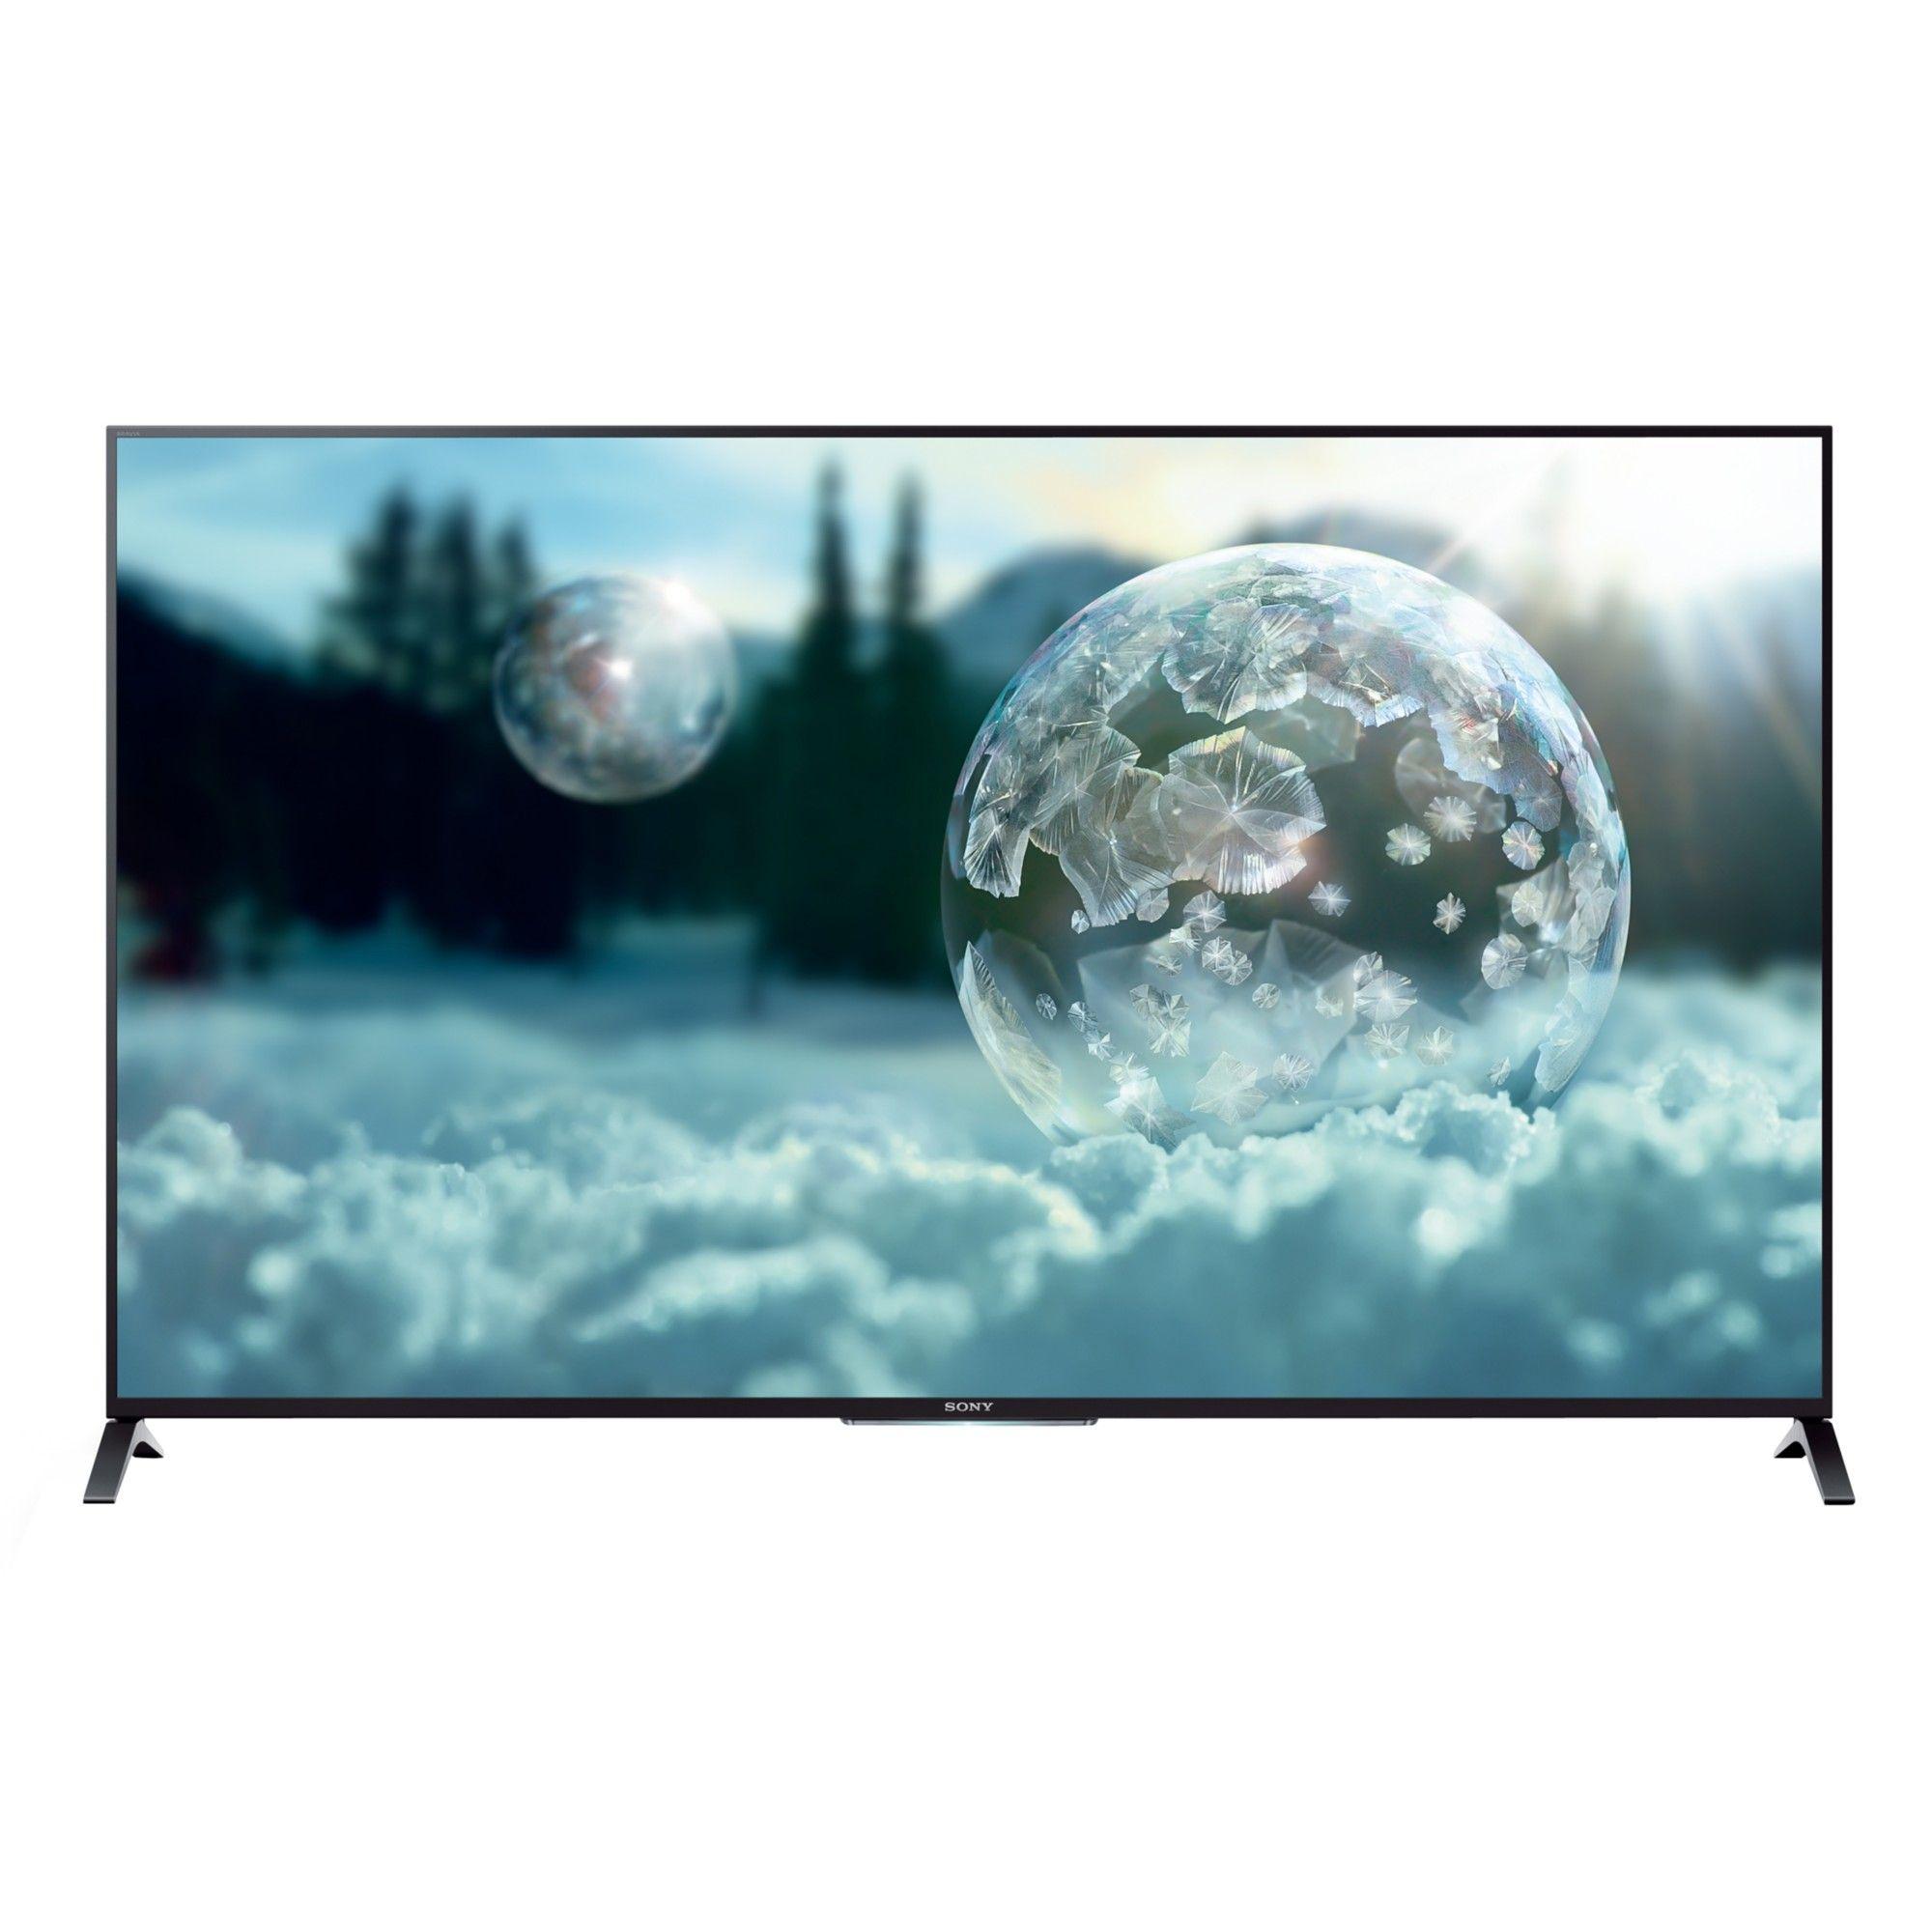 Sony Bravia Kd49x8505 Led 4k Ultra Hd 3d Smart Tv 49 Nfc With